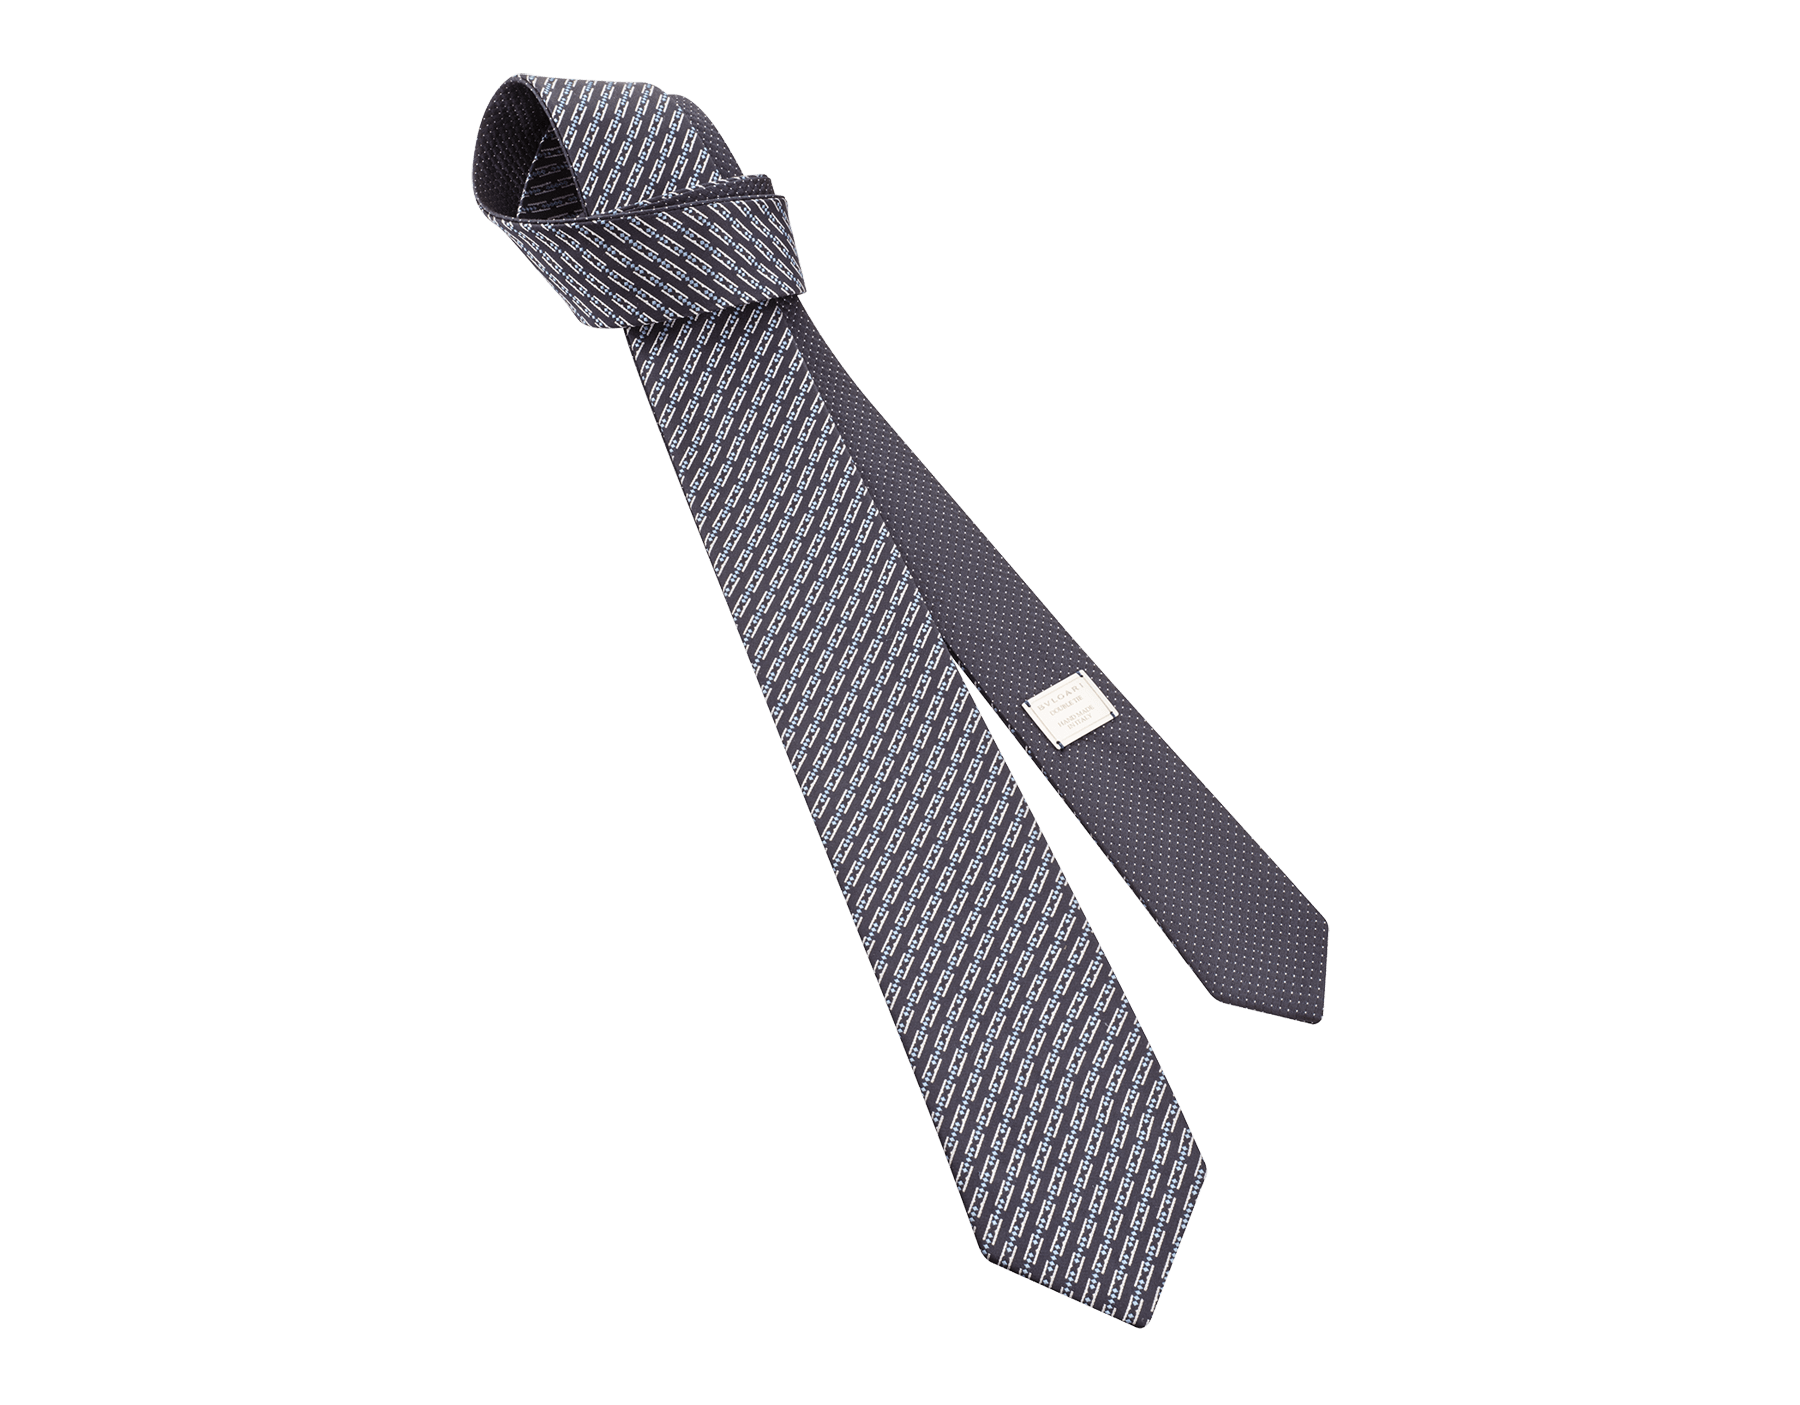 Rote doppelseitige Double BZero3D Krawatte aus feiner Seide. DOUBLEBZERO3D image 1